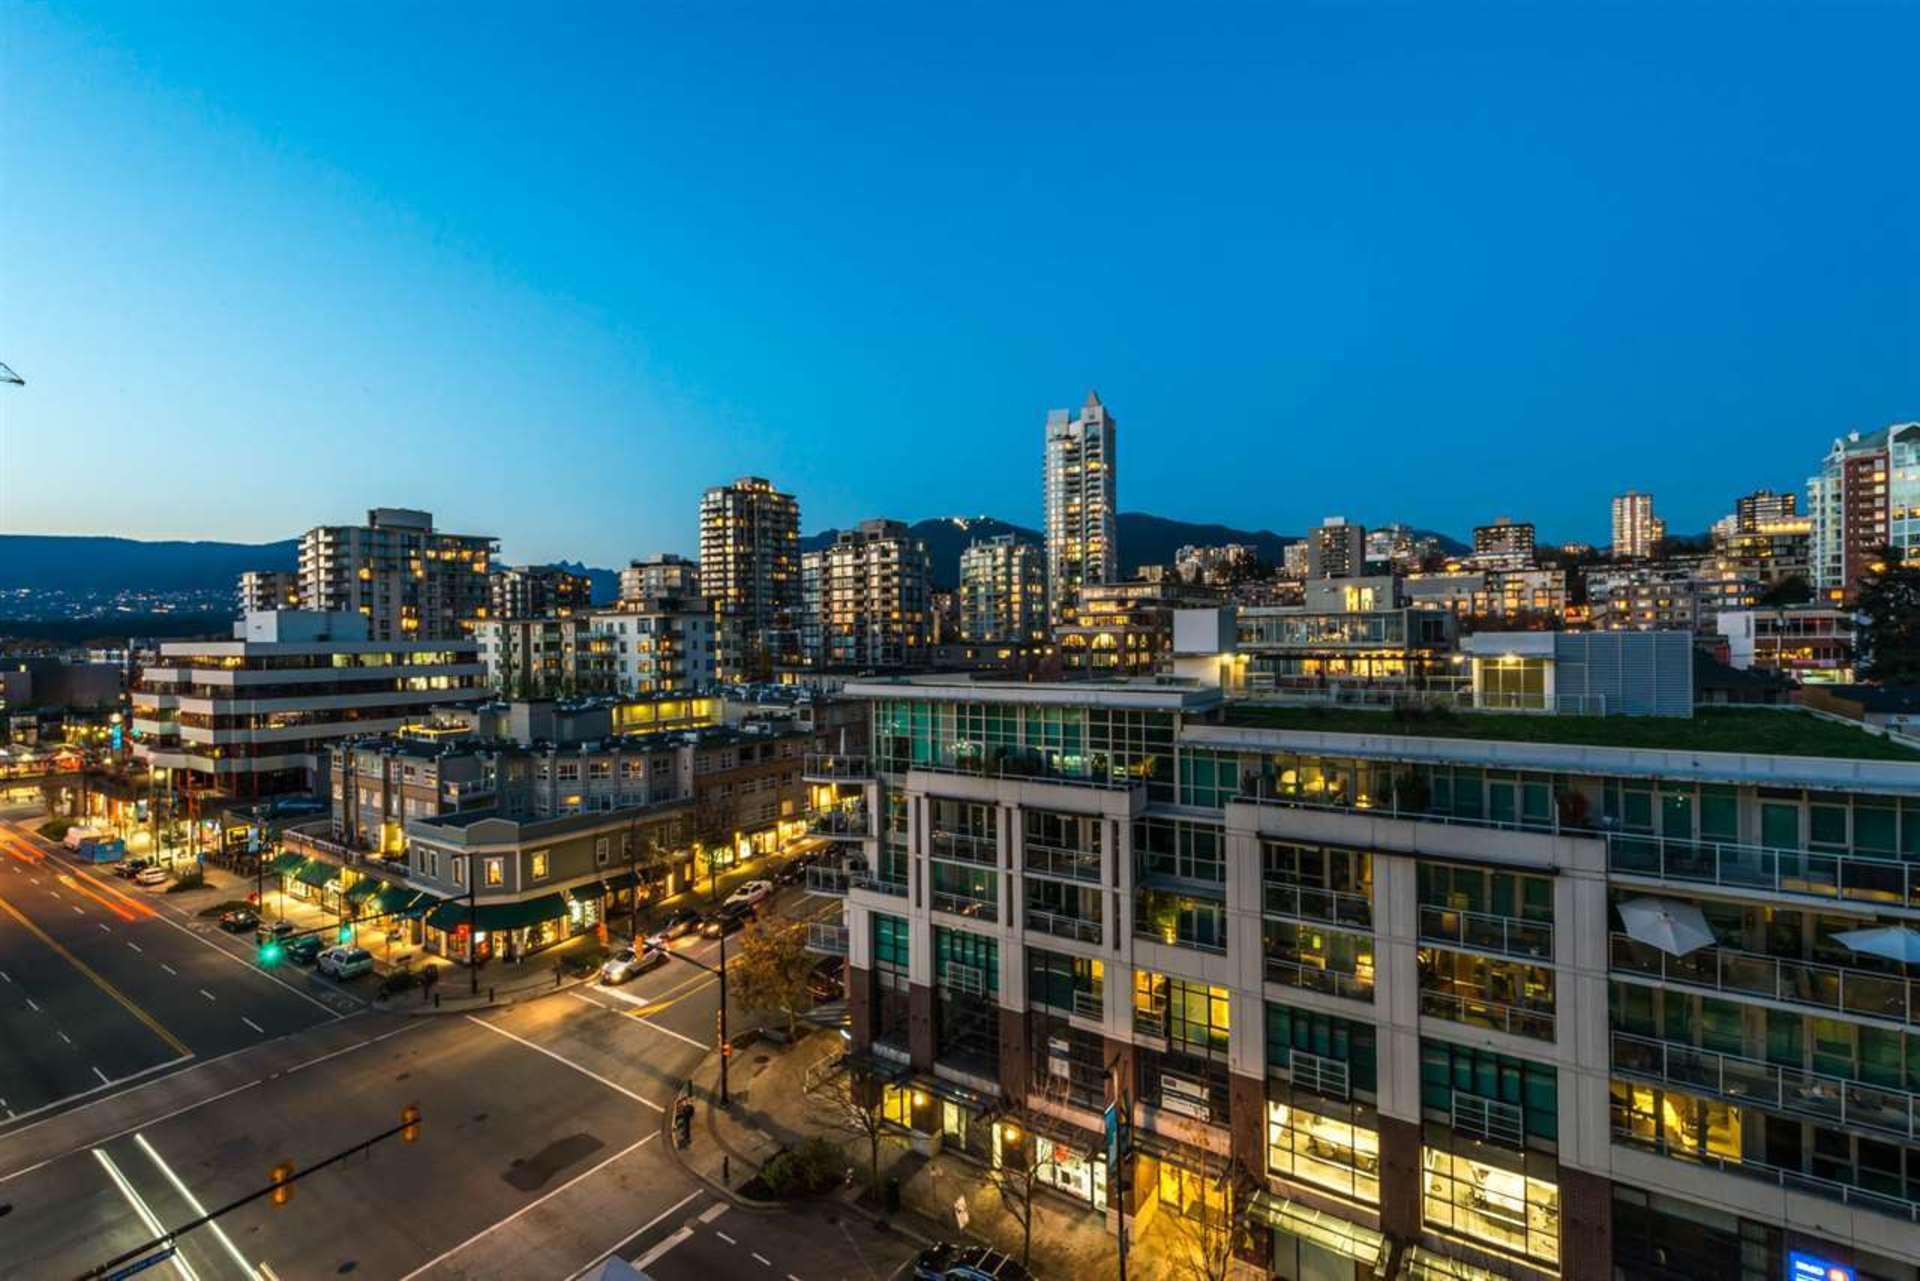 133-e-esplanade-avenue-lower-lonsdale-north-vancouver-02 at 806 - 133 E Esplanade Avenue, Lower Lonsdale, North Vancouver